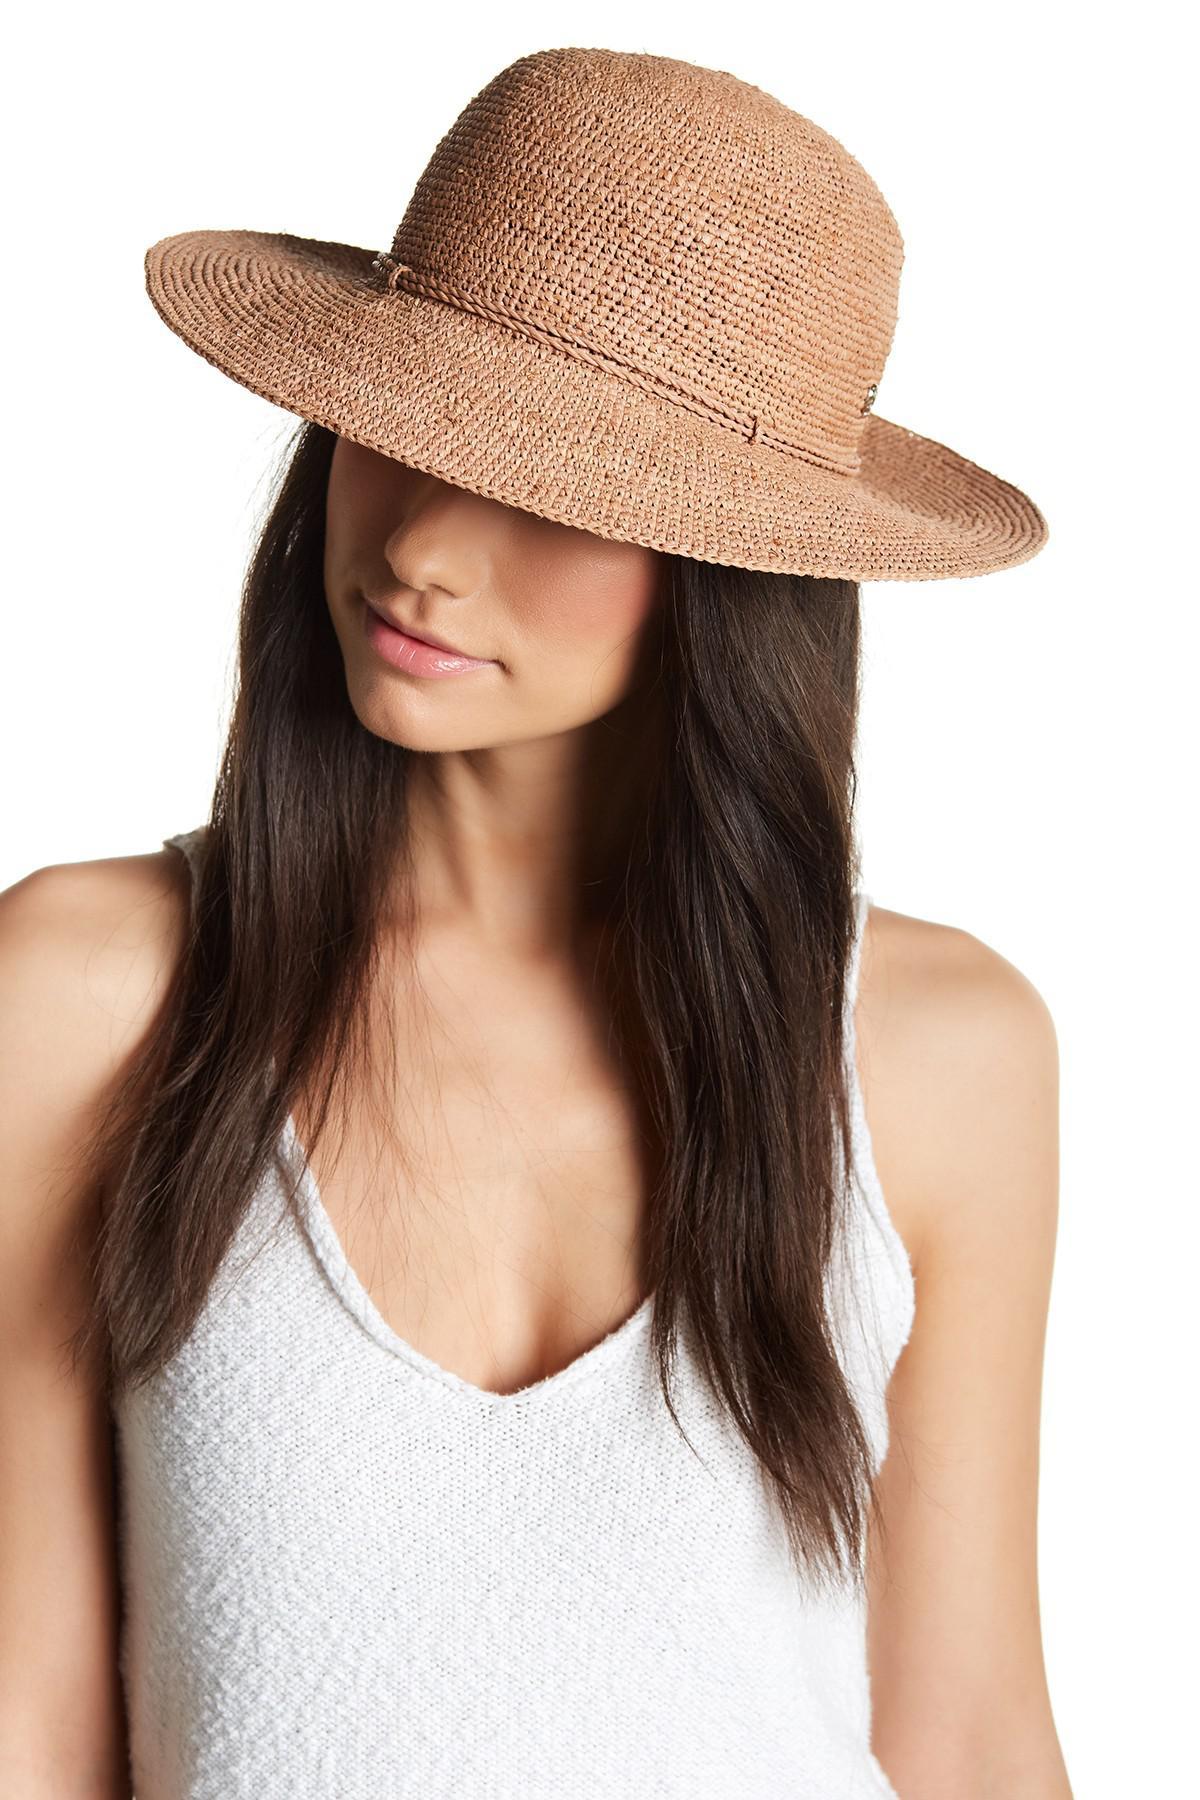 Lyst - Helen Kaminski Caicos Hat 6417d1ce16ca